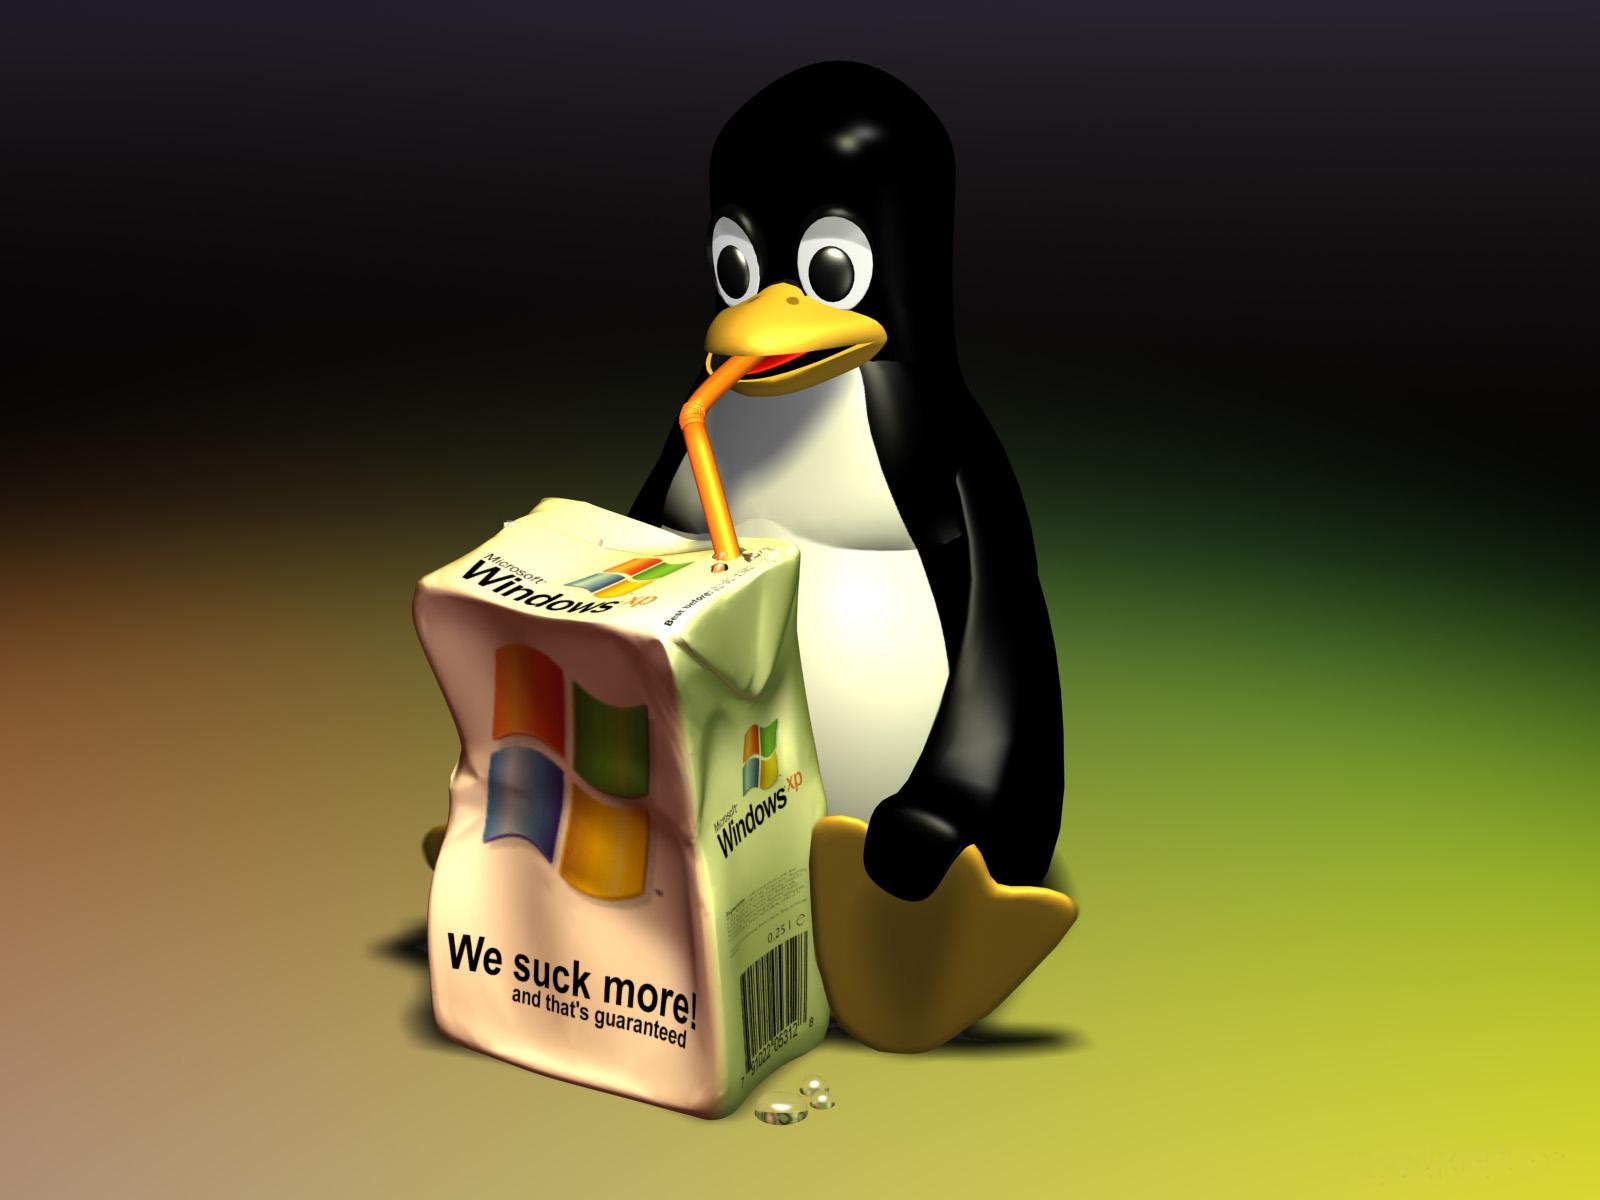 http://4.bp.blogspot.com/-cGVi3DKUhT0/TasgmMNhS-I/AAAAAAAAABA/UhoxekXQIDg/s1600/linux-wallpaper--1600x1200--tux-we-suck-more.jpg